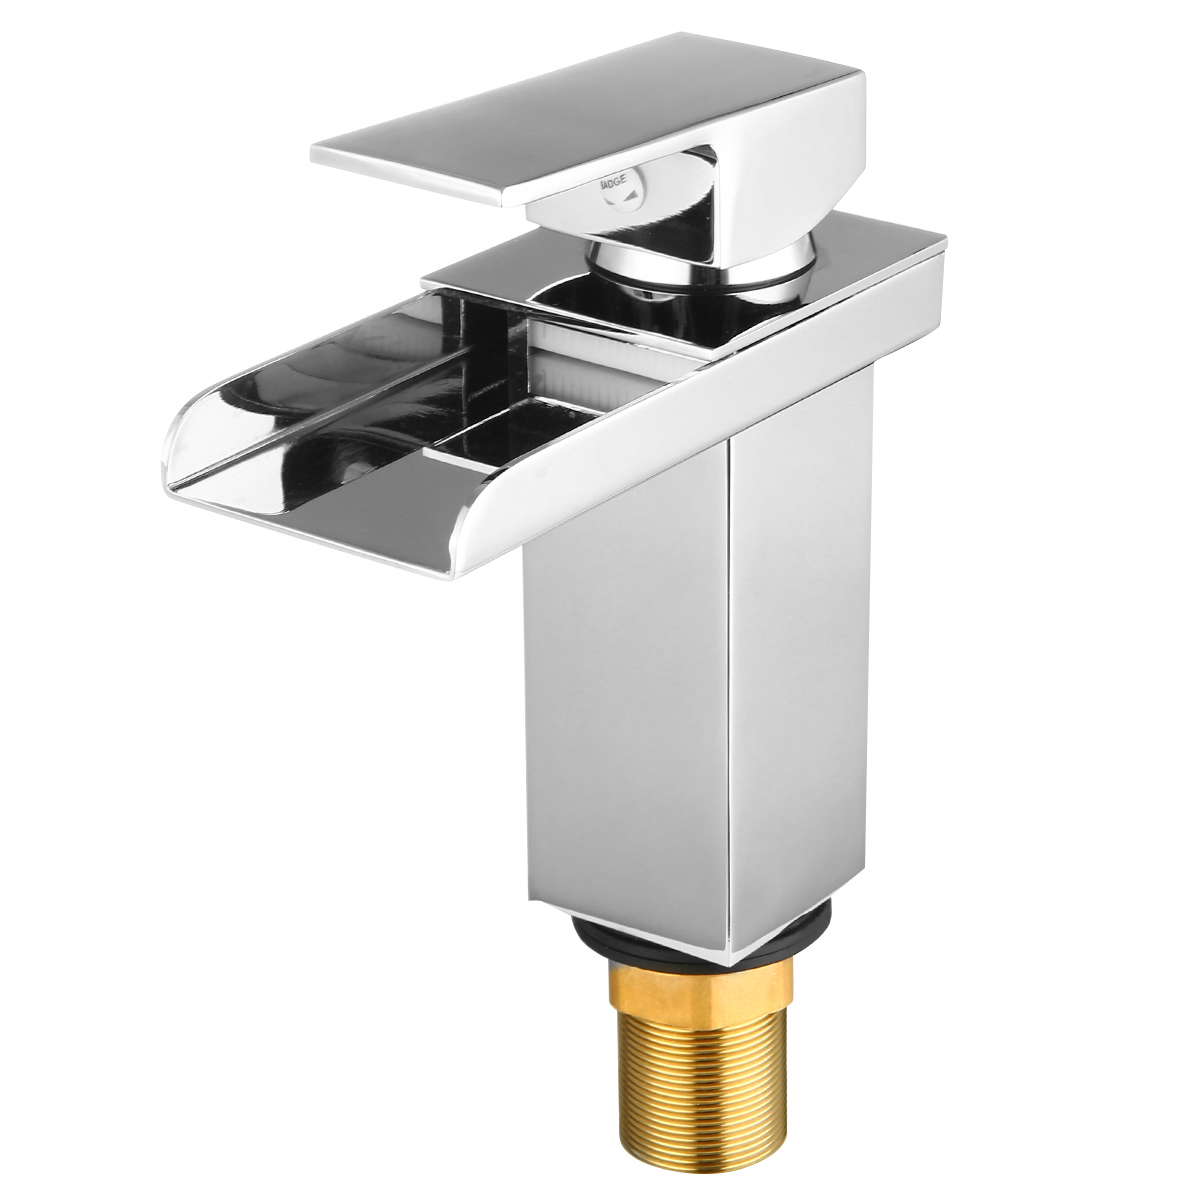 1pcs Brass Chrome Waterfall Mixer Tap Kitchen Bathroom Single Handle Single Hole Sink Bathroom Faucets Mayitr1pcs Brass Chrome Waterfall Mixer Tap Kitchen Bathroom Single Handle Single Hole Sink Bathroom Faucets Mayitr